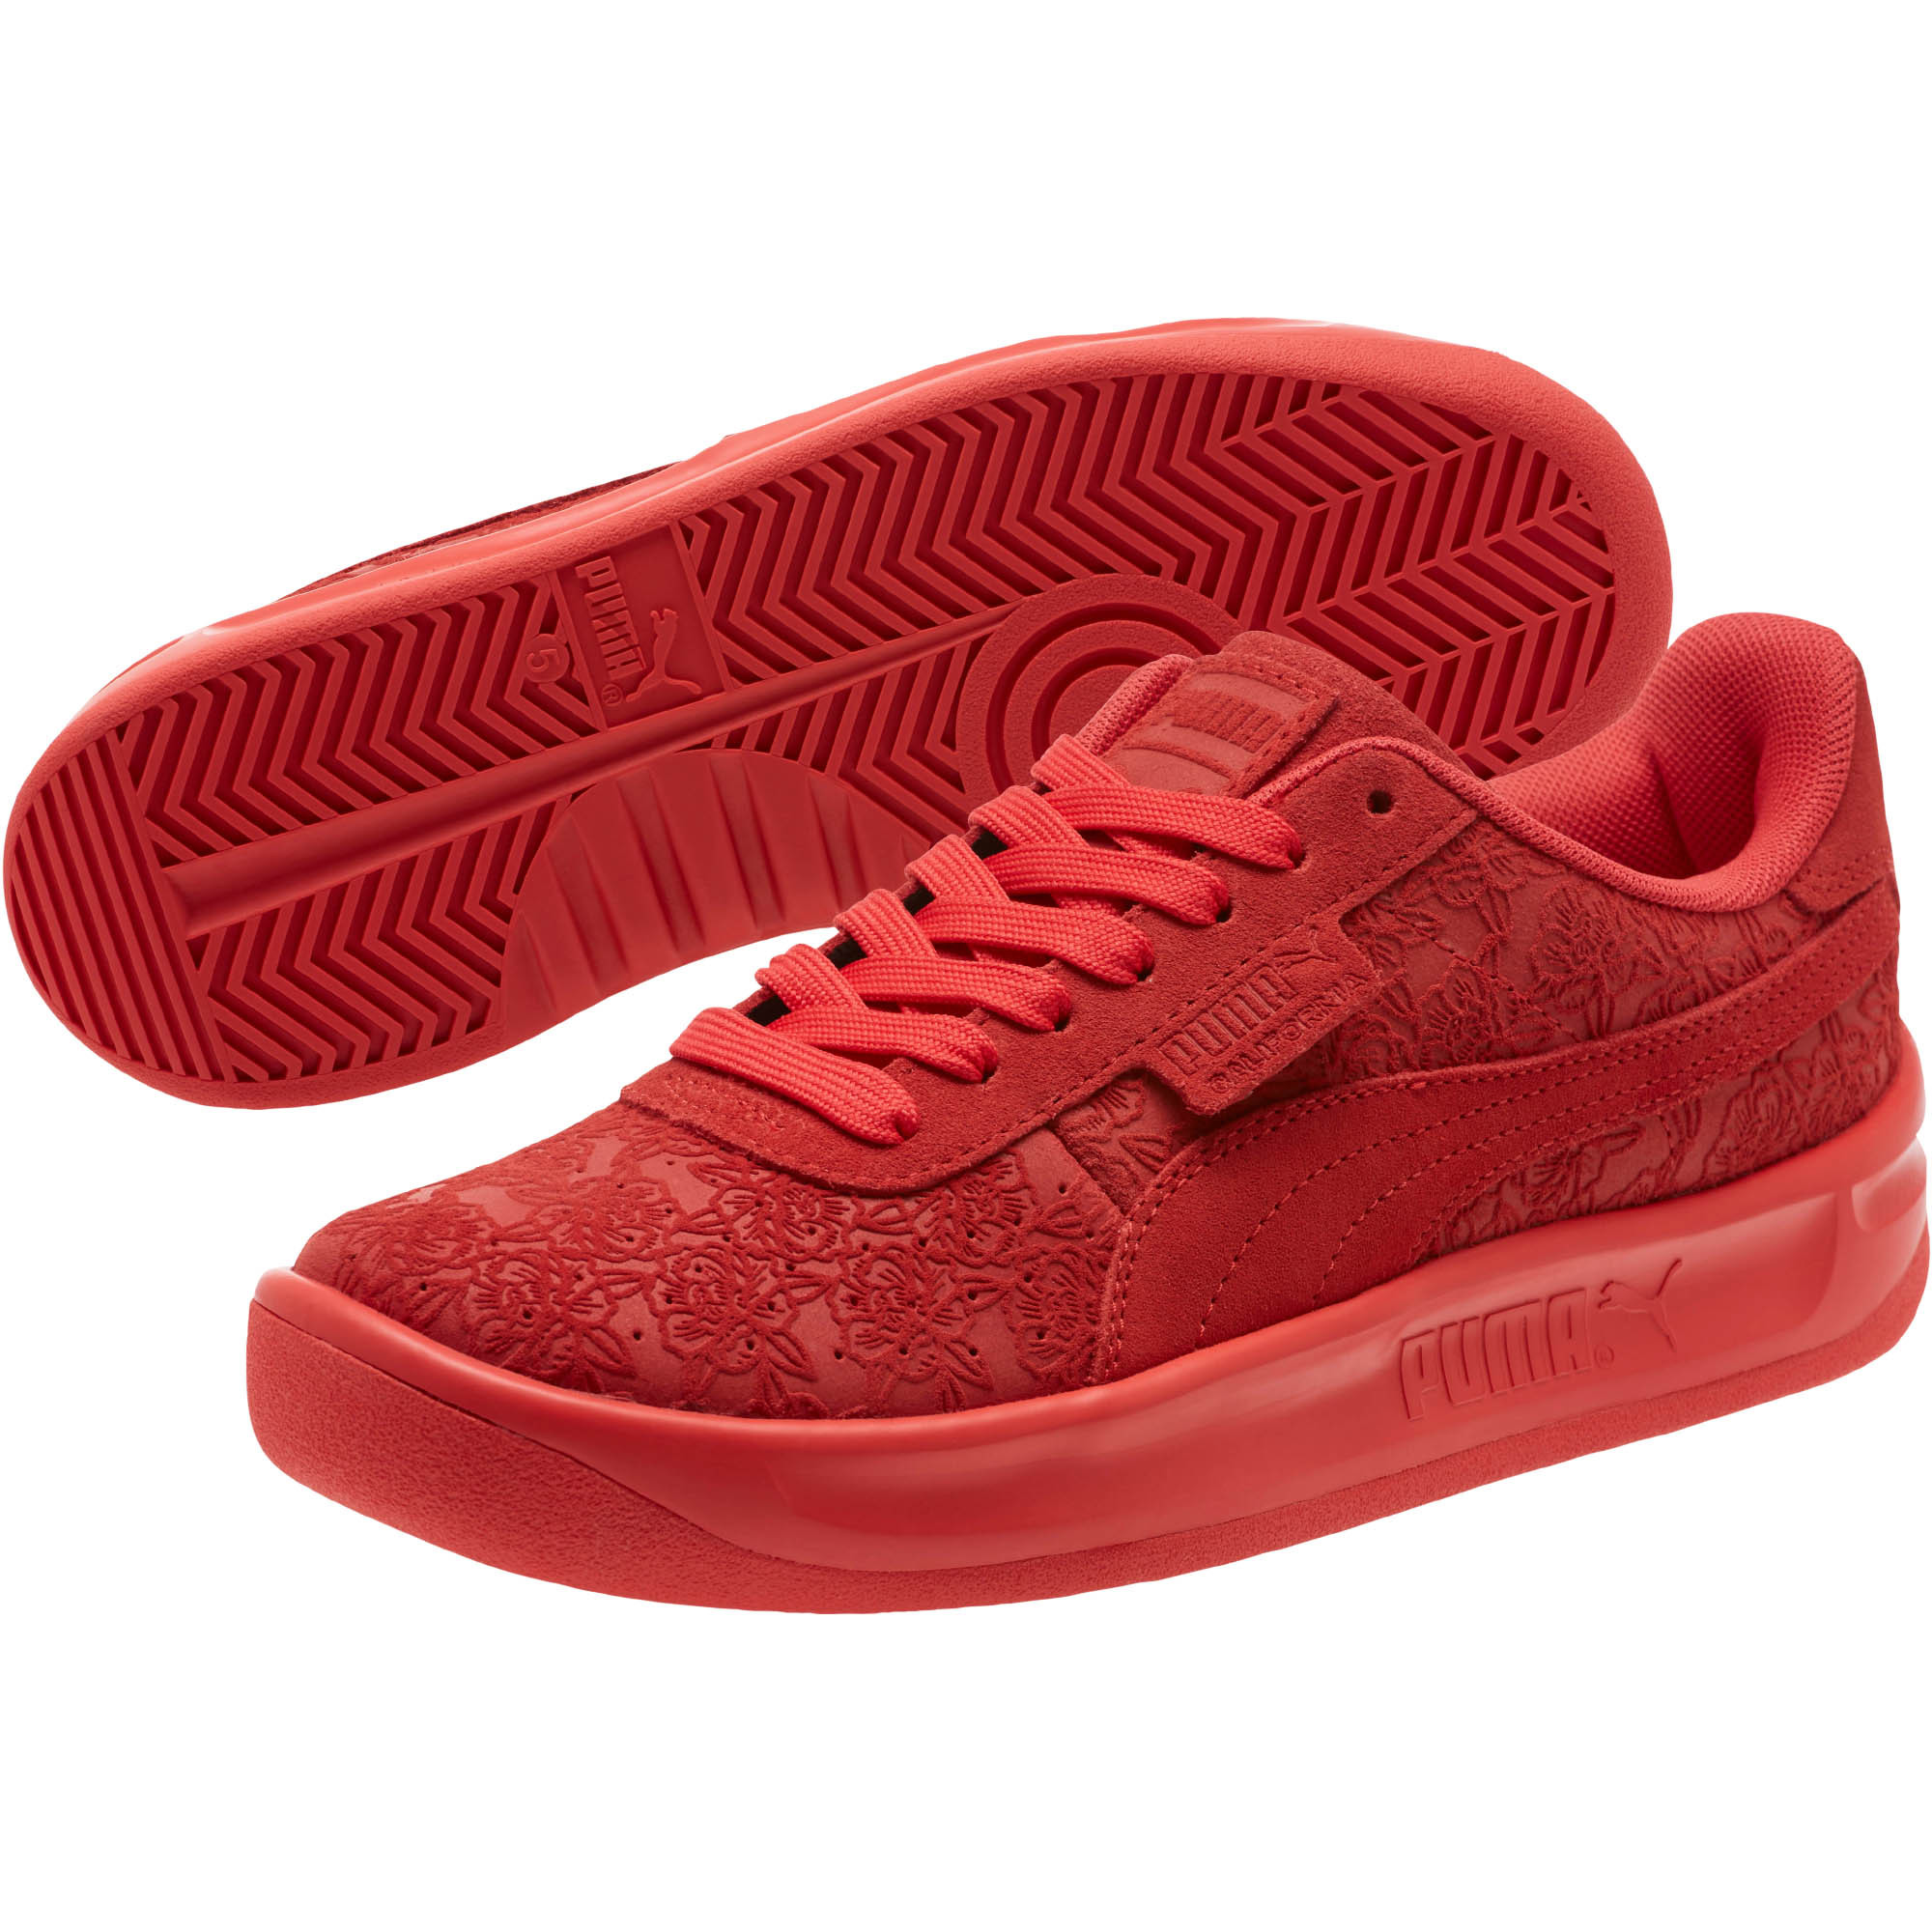 wholesale dealer bed38 9c595 PUMA-California-Embossed-Floral-Women-s-Sneakers-Women-